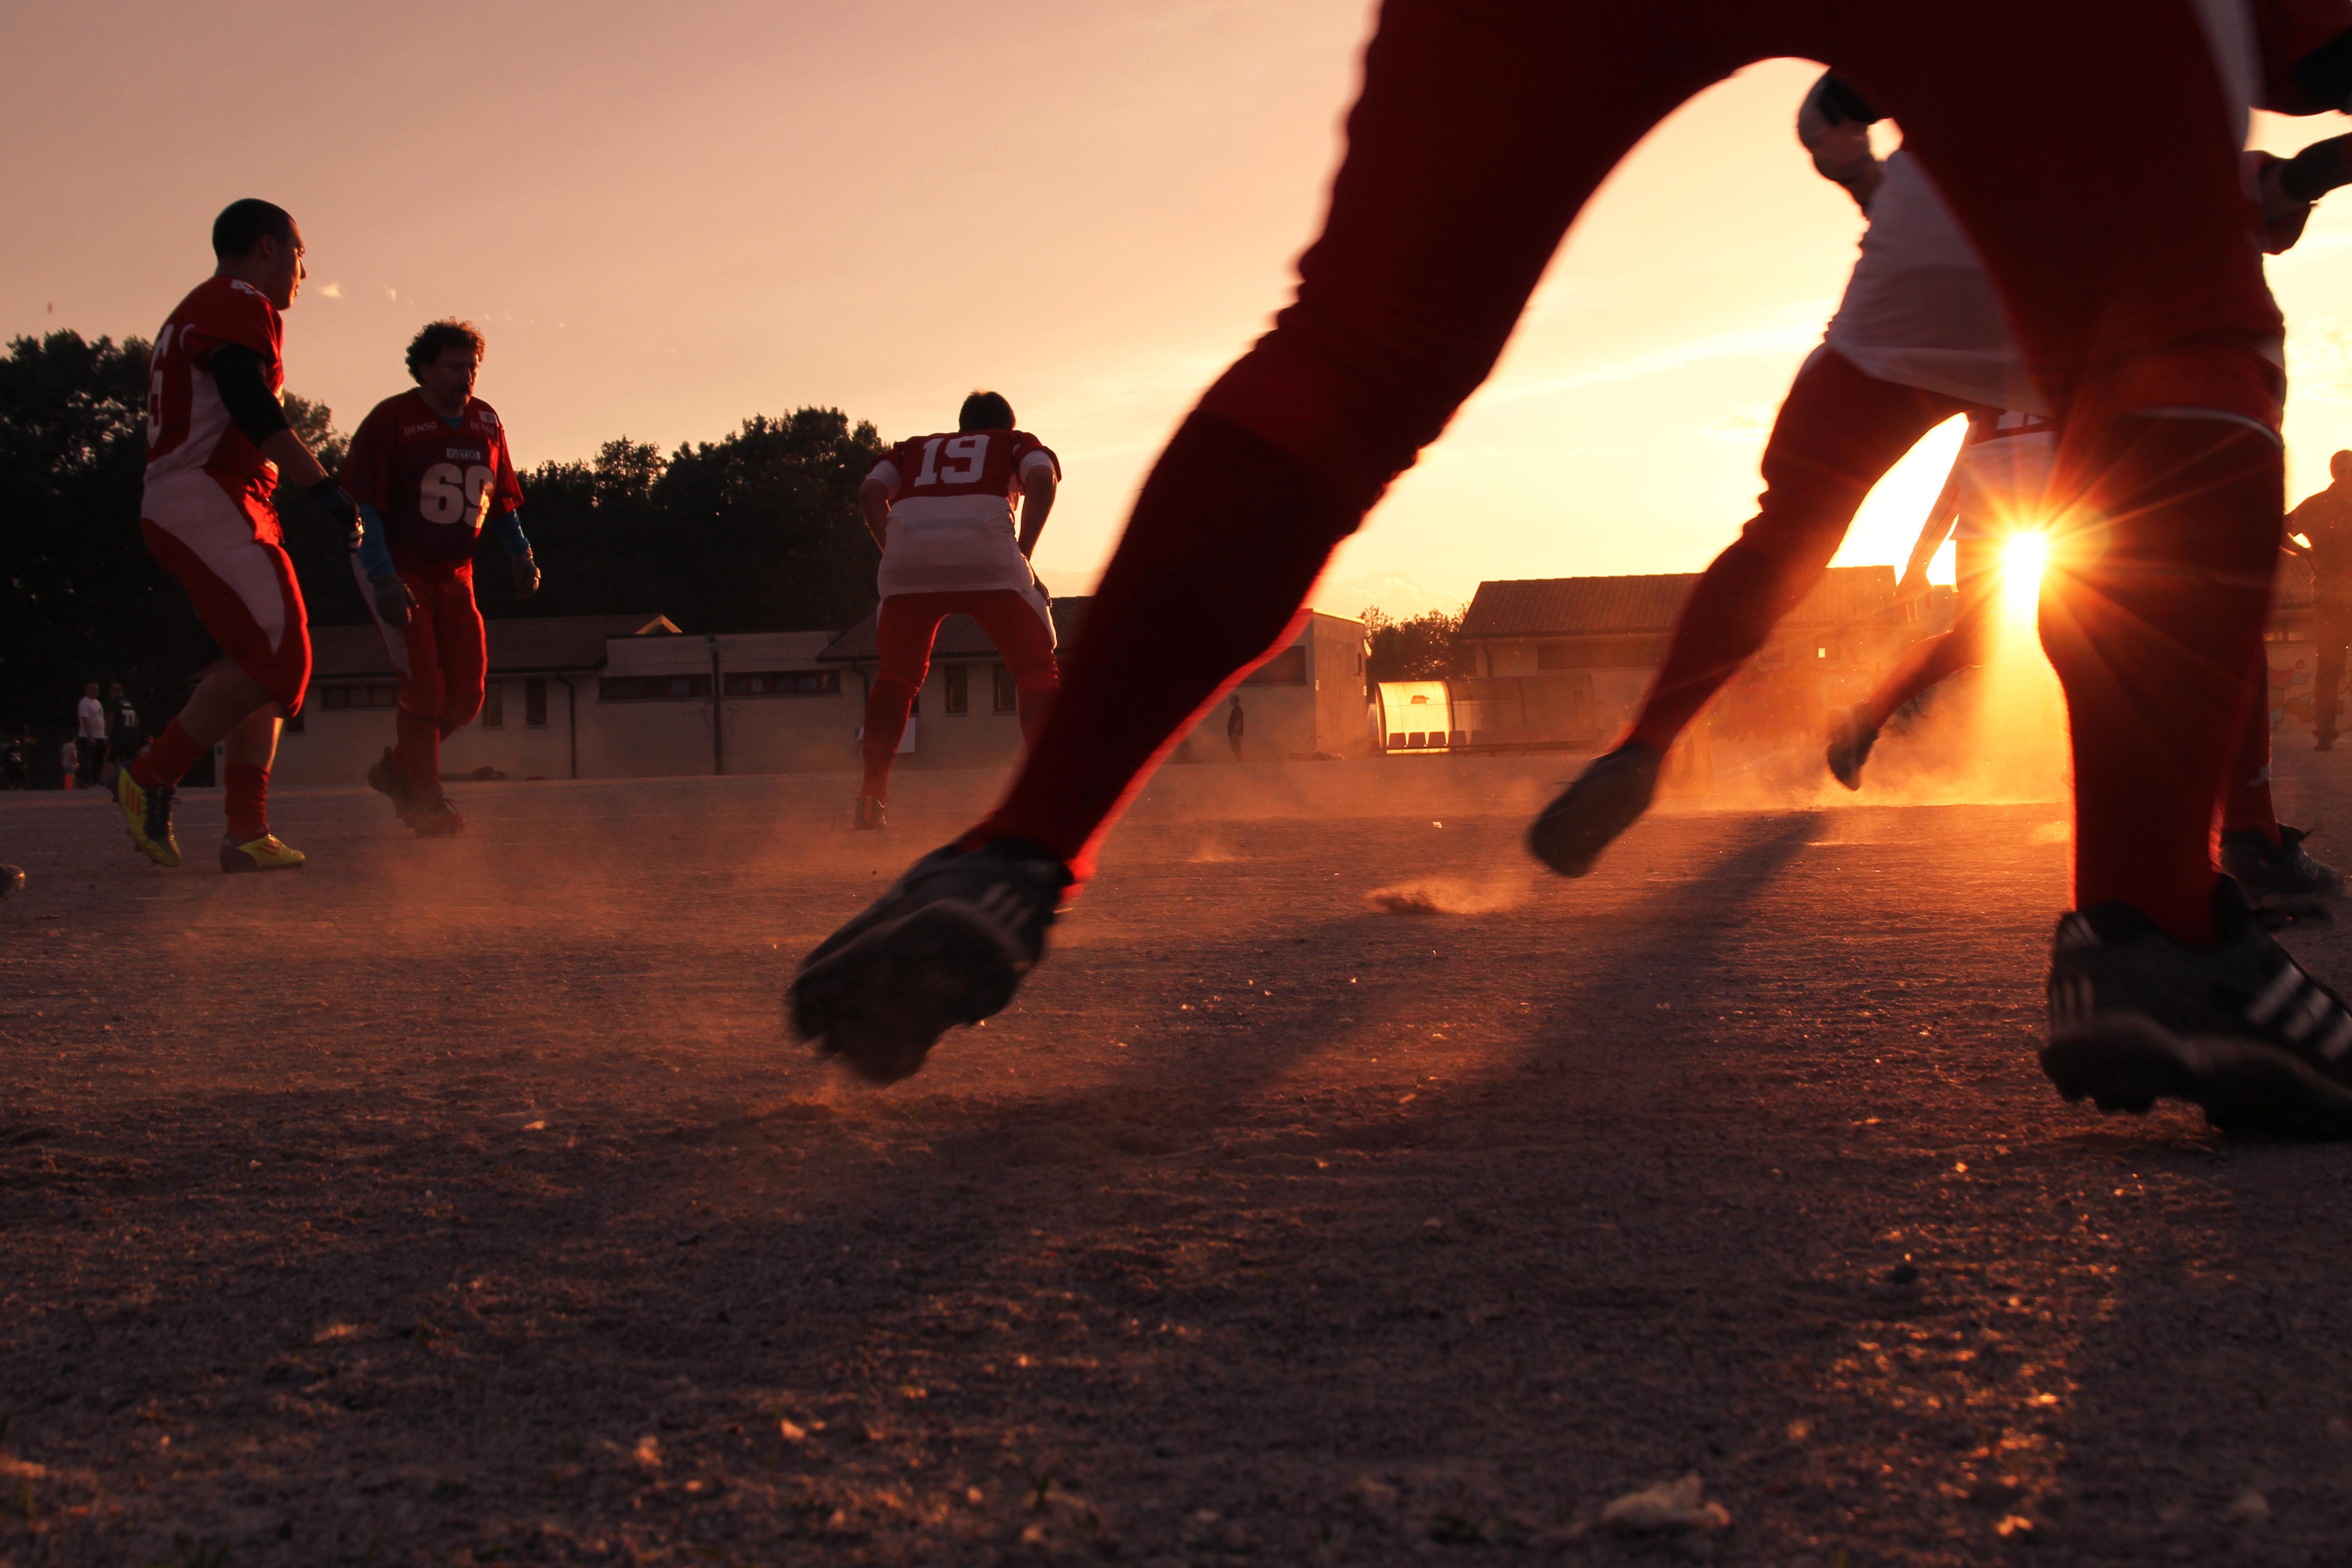 Free Images People Sun Sunset Sport Night Evening